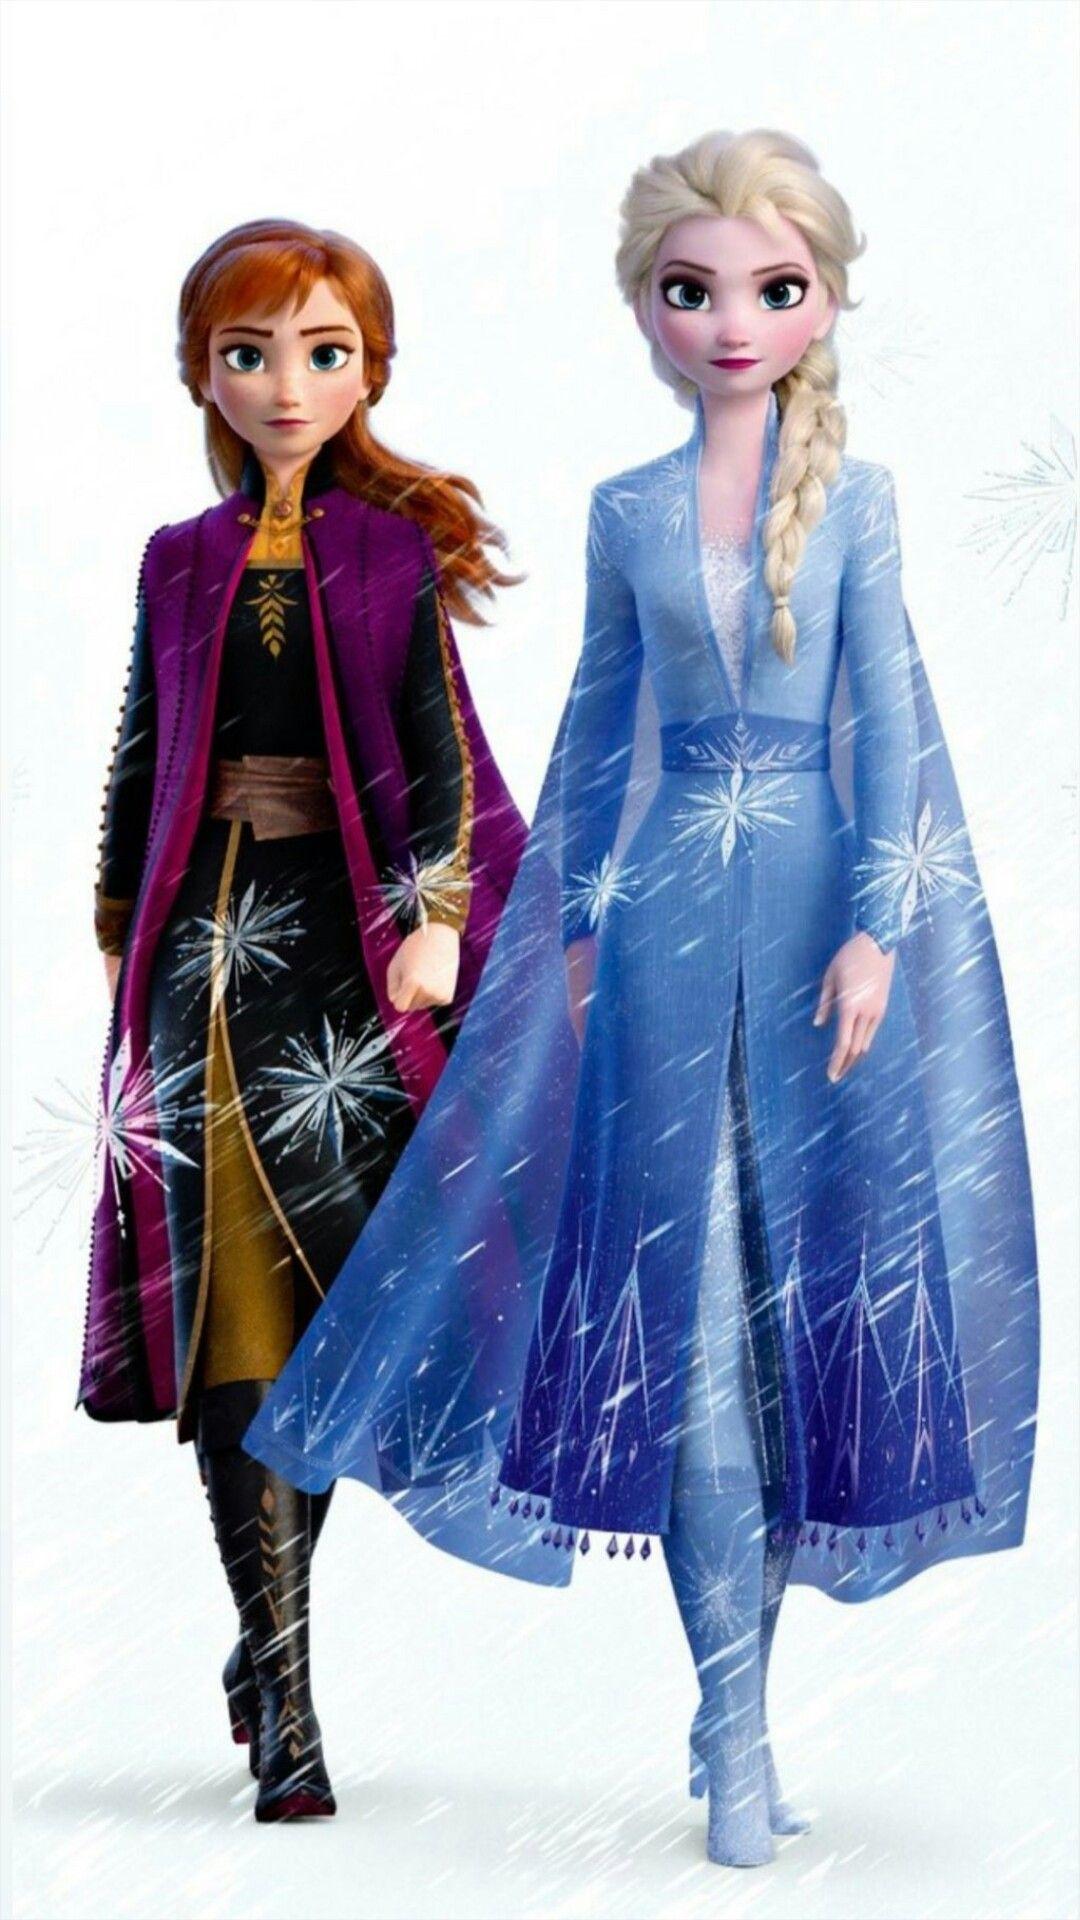 Anna And Elsa Frozen Ii Disney Frozen Elsa Art Frozen Disney Movie Disney Princess Pictures